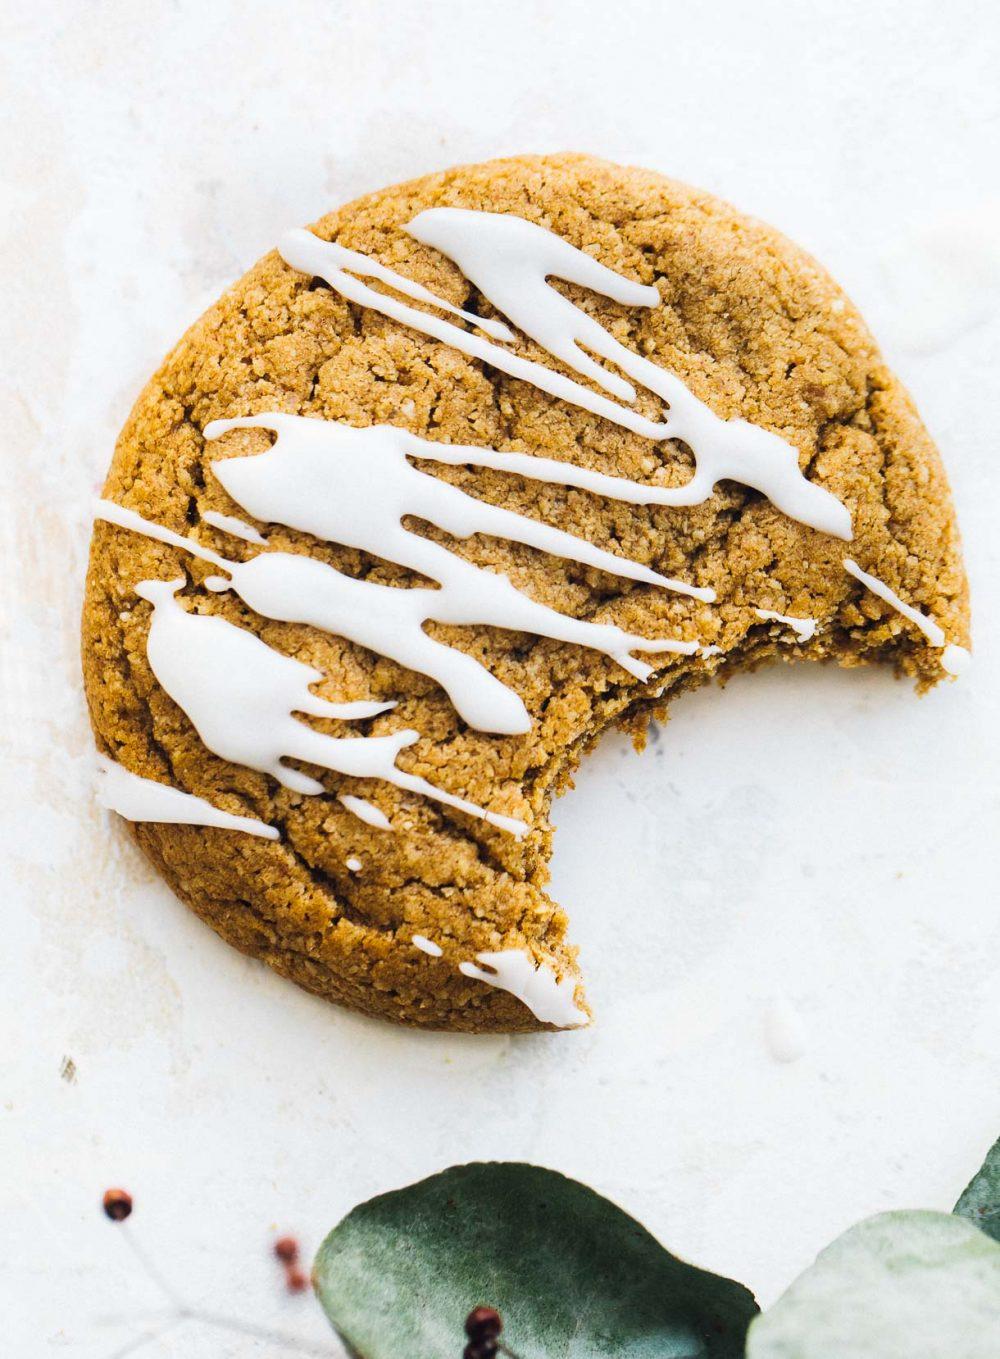 gluten-free pumpkin cookie with bite taken out of it